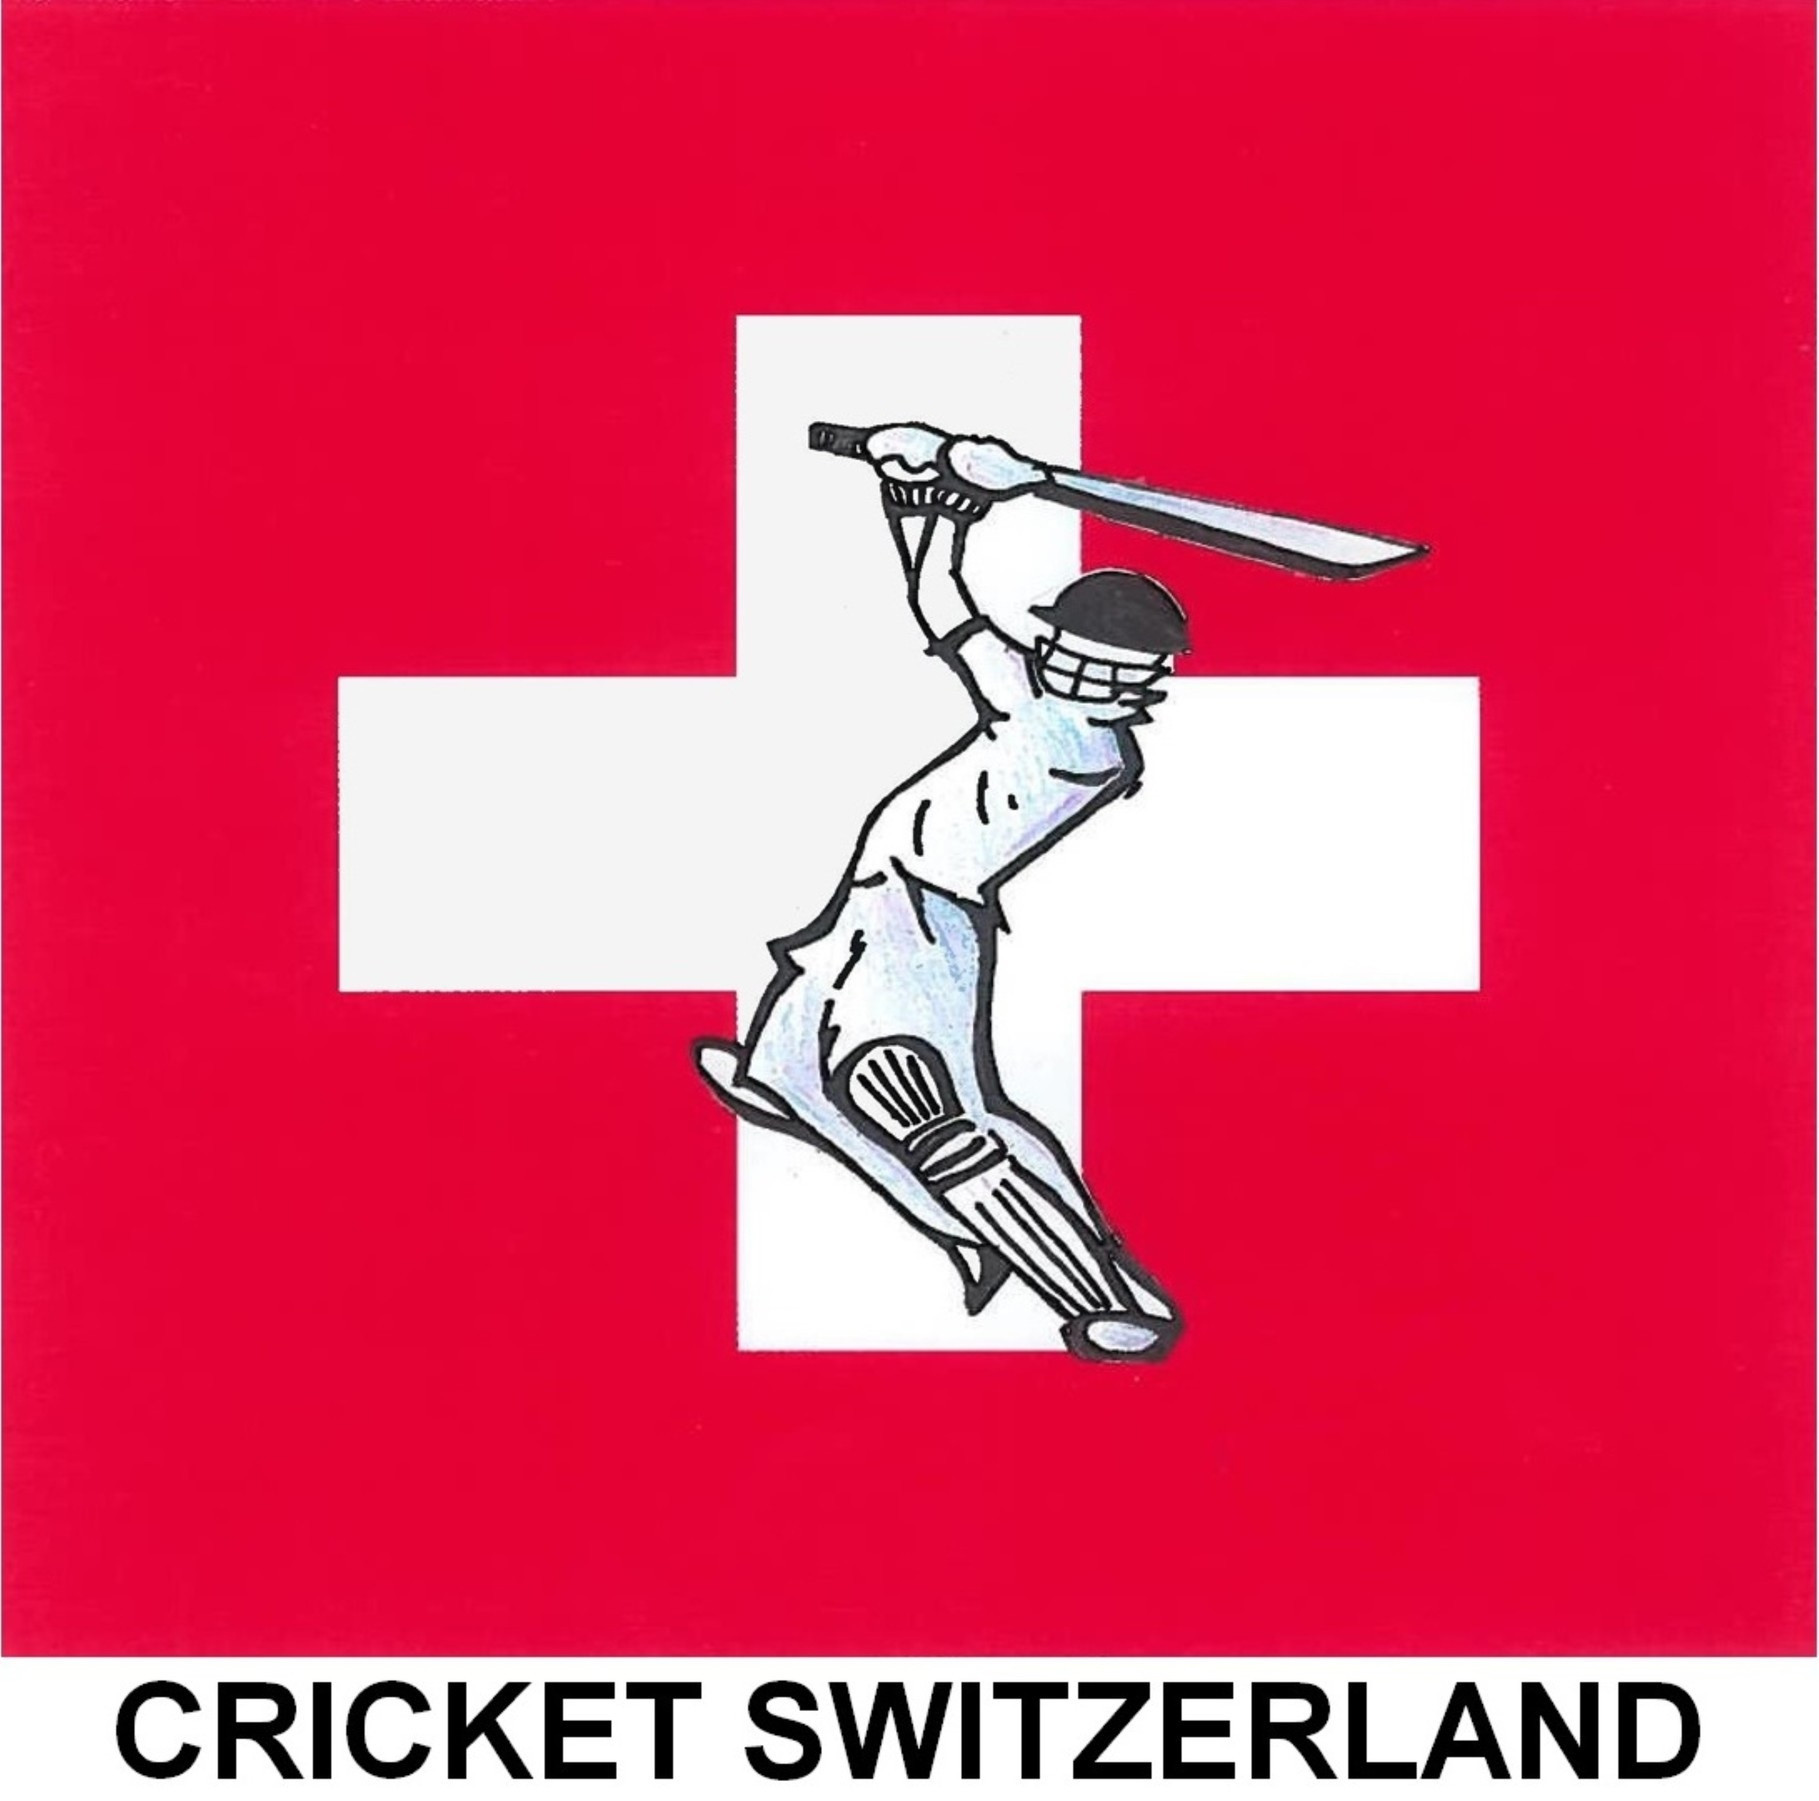 Cricket Switzerland bidding to regain ICC associate member status - eight years after suspension